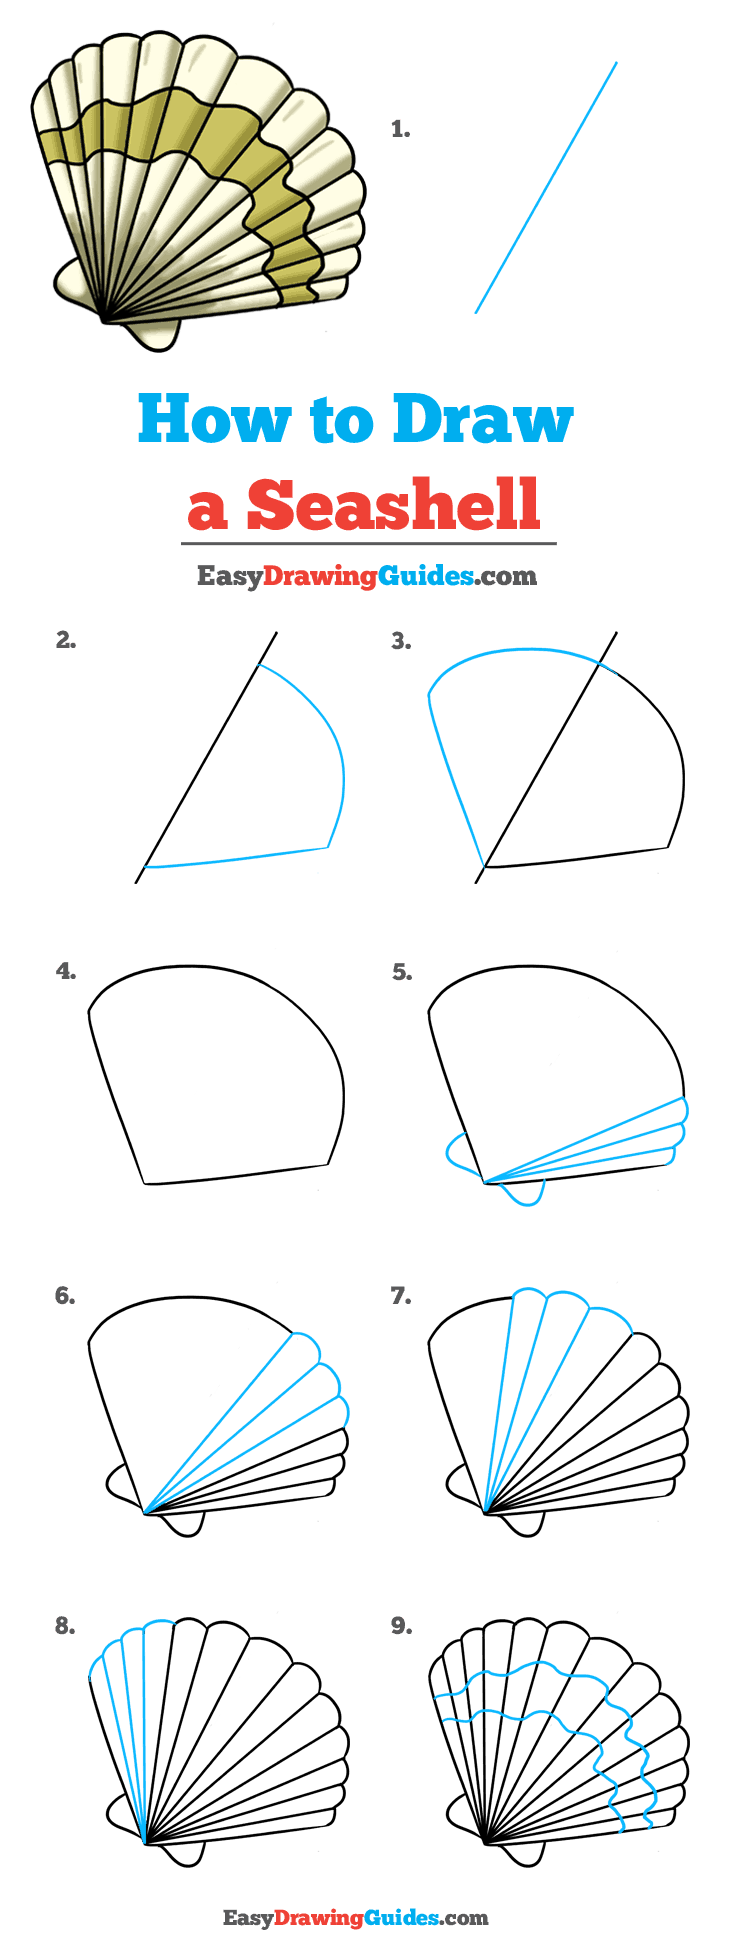 How To Draw A Seashell : seashell, Seashell, Really, Drawing, Tutorial